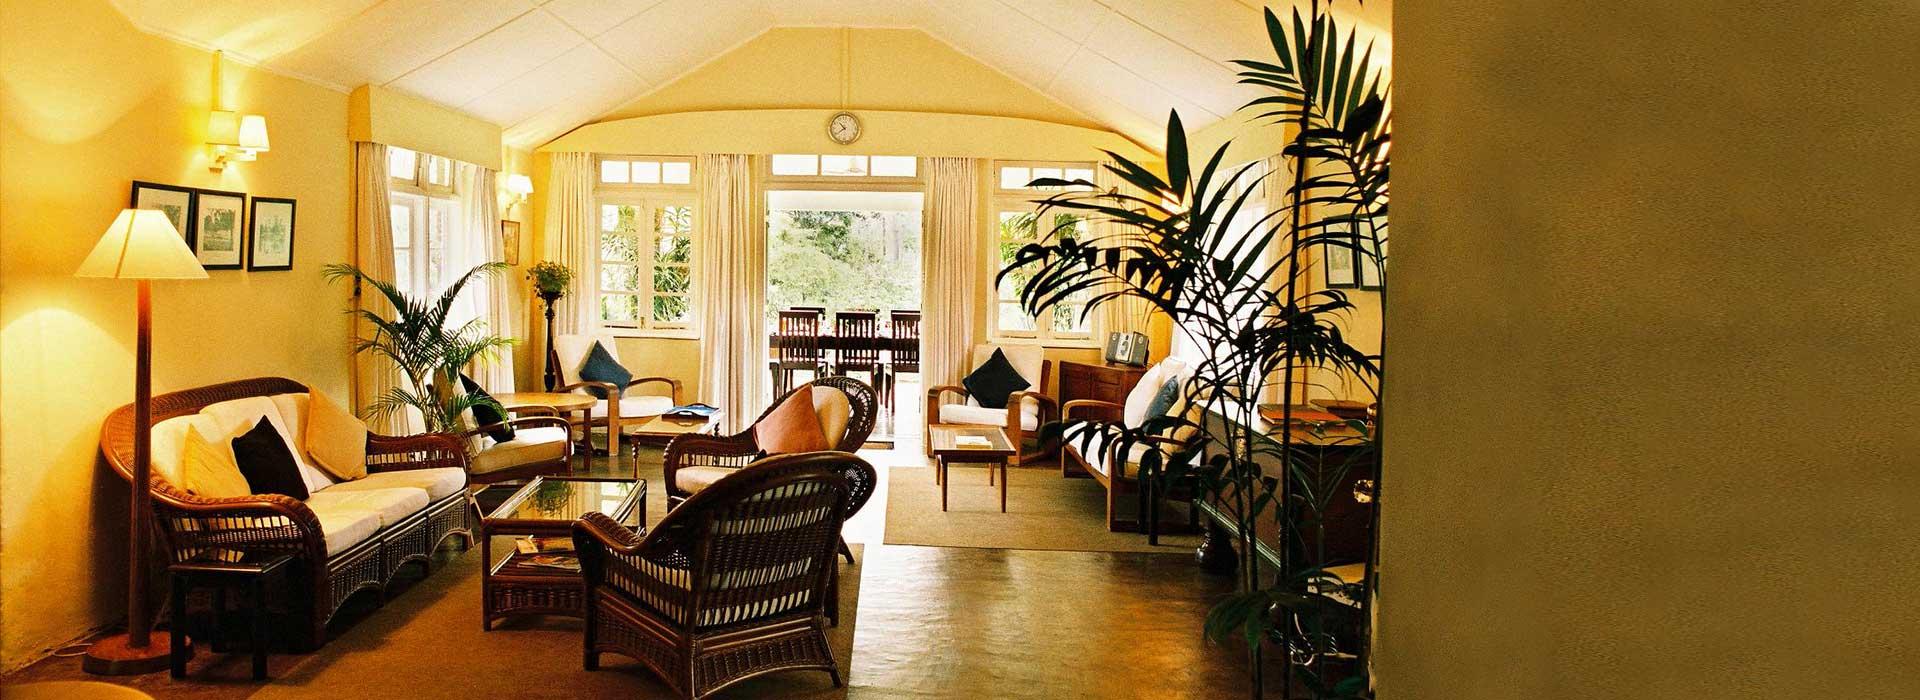 Kirchhayn Bungalow - Lounge